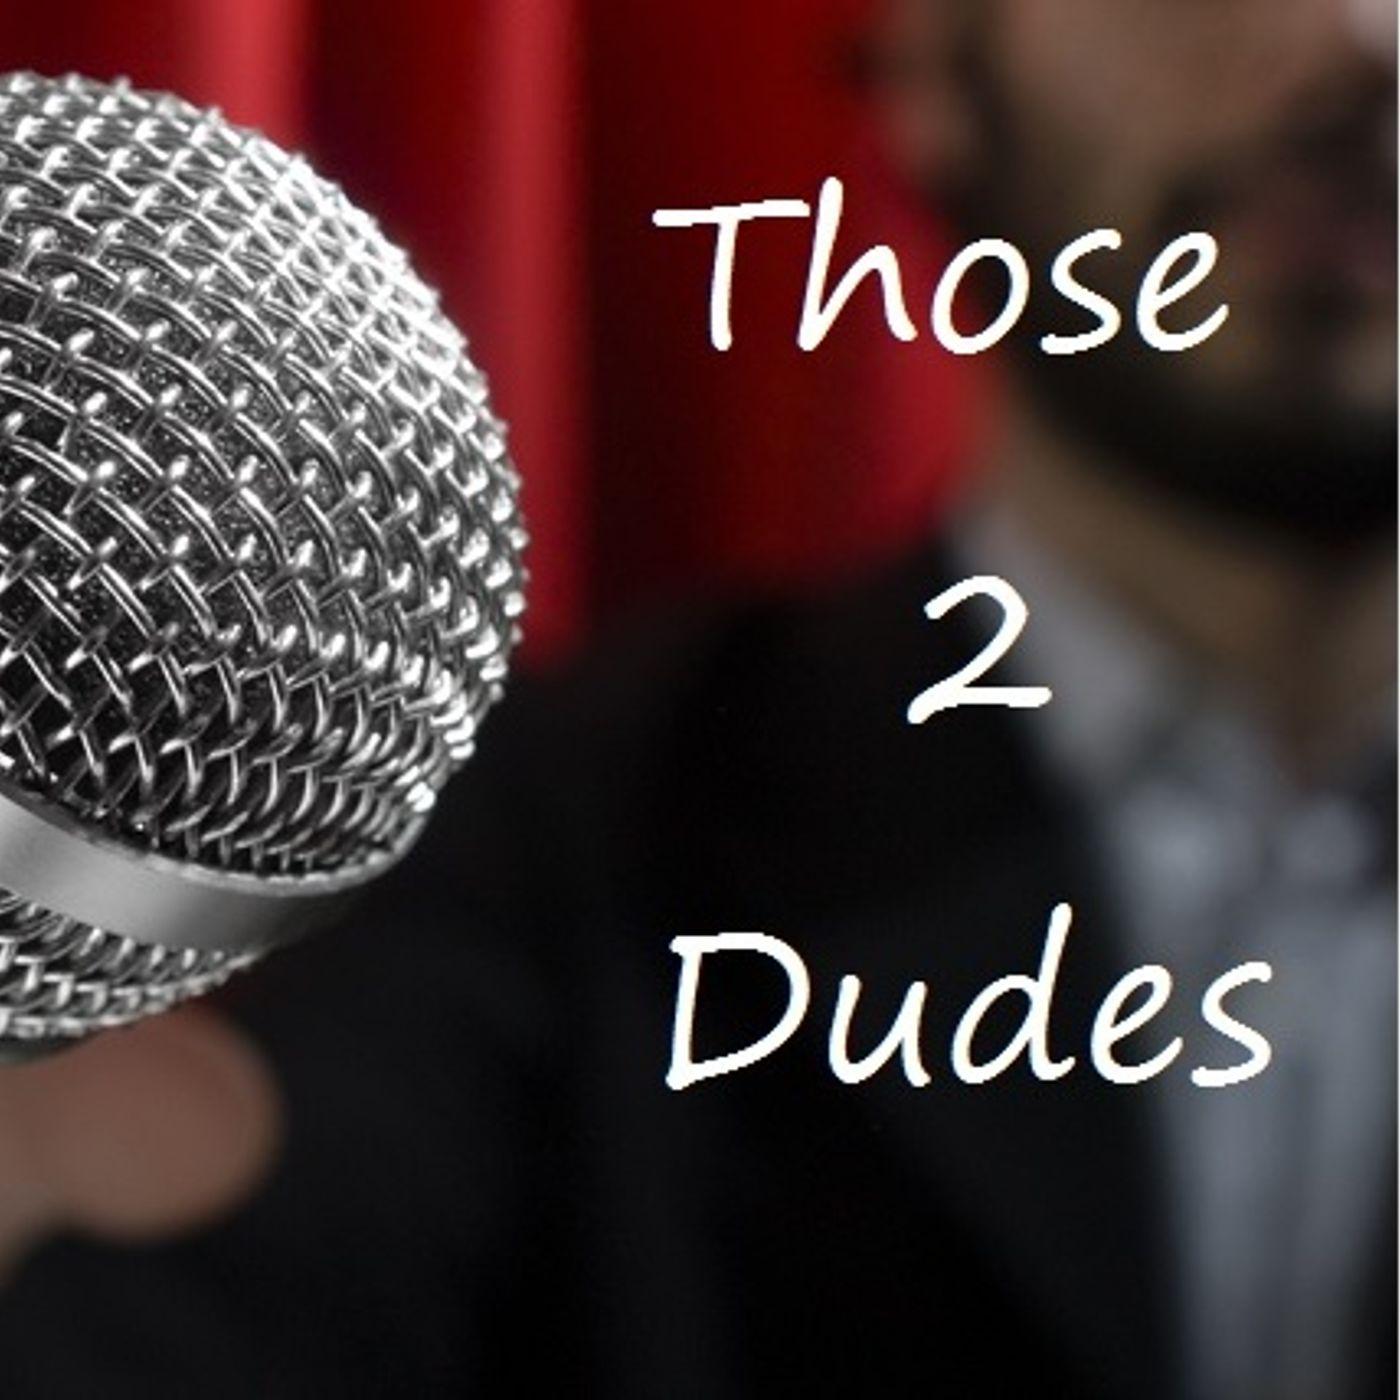 Those 2 Dudes